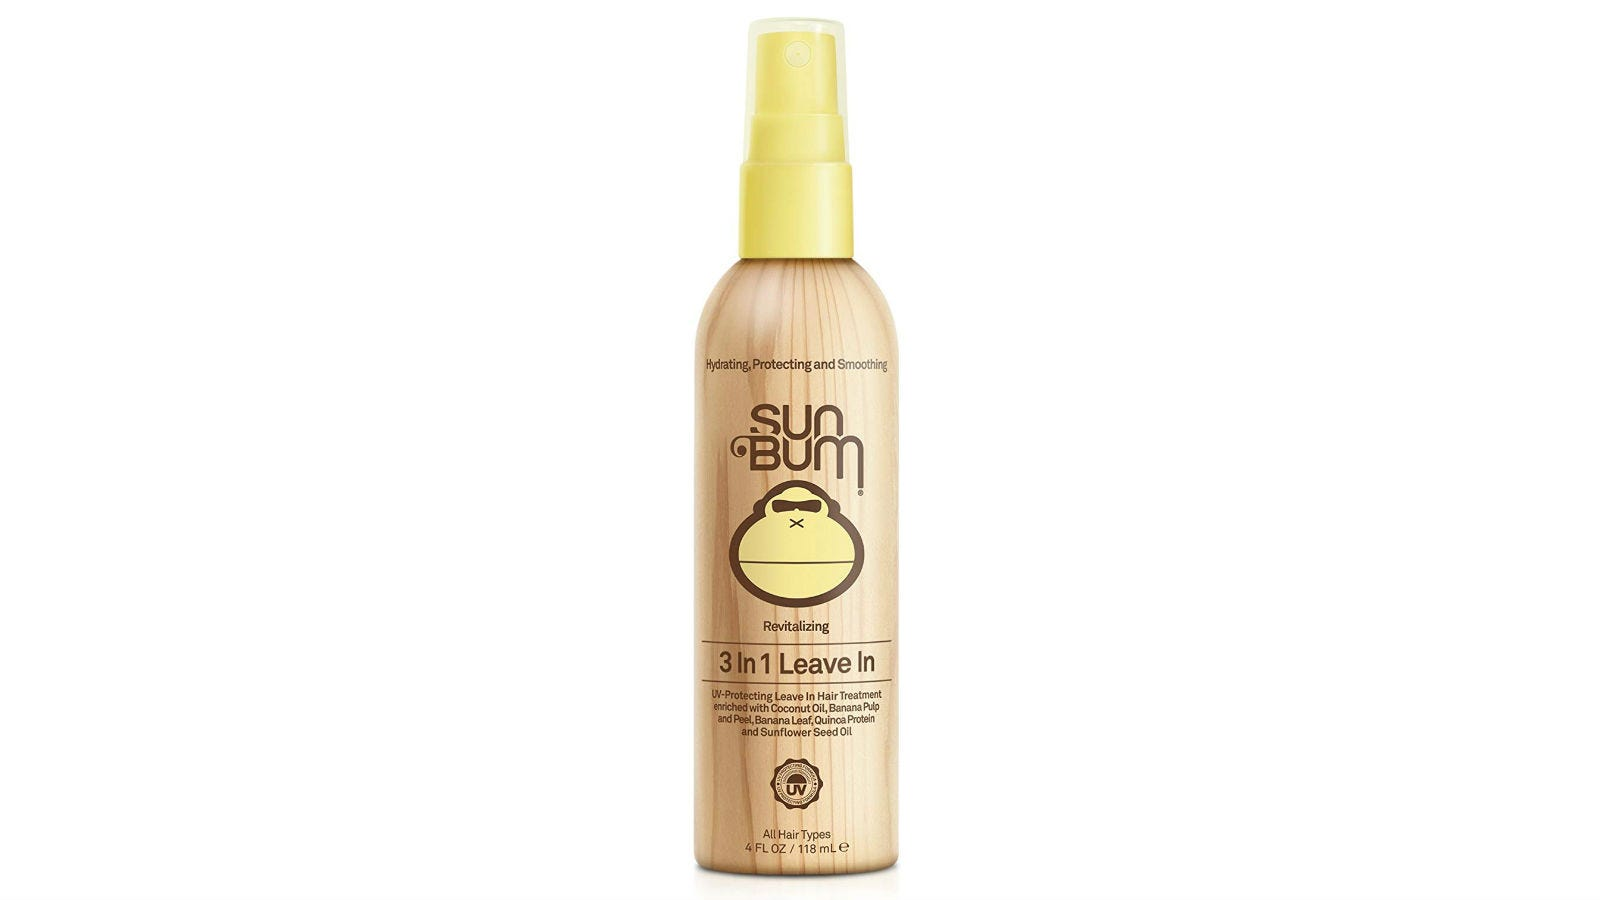 A spray bottle of Sun Bum Beach Formula 3-in-1 Leave-In Hair Conditioner Spray.